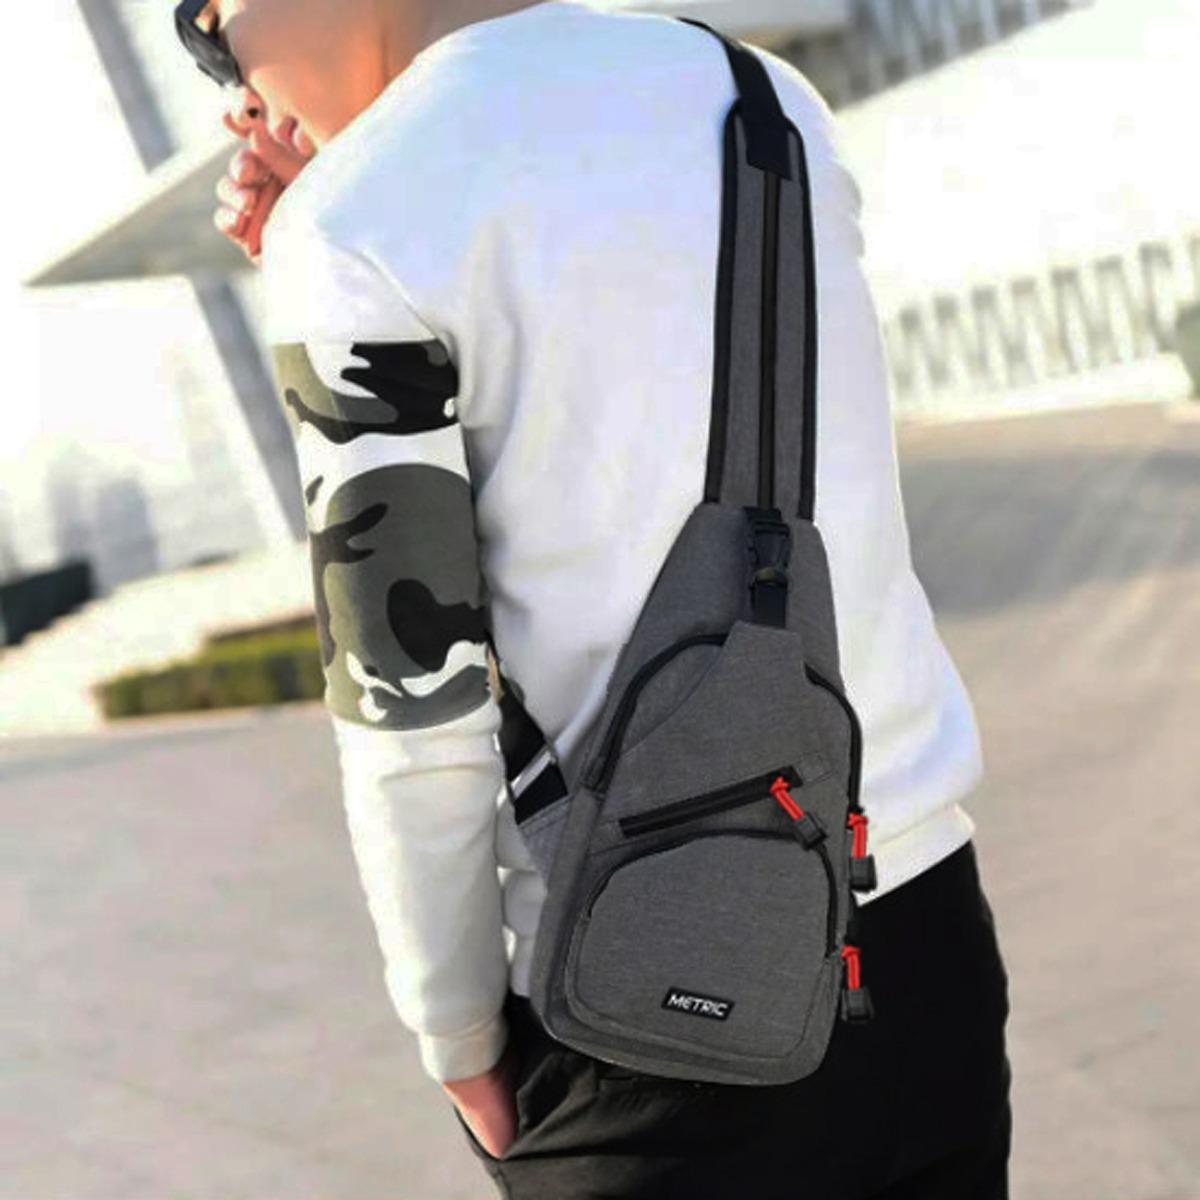 Metric Sling Bag Korea Tas Ransel Tali Satu Tas Waistbag Tas Selempang Tas  Gadget Tas Smartphone 146f0a83b3